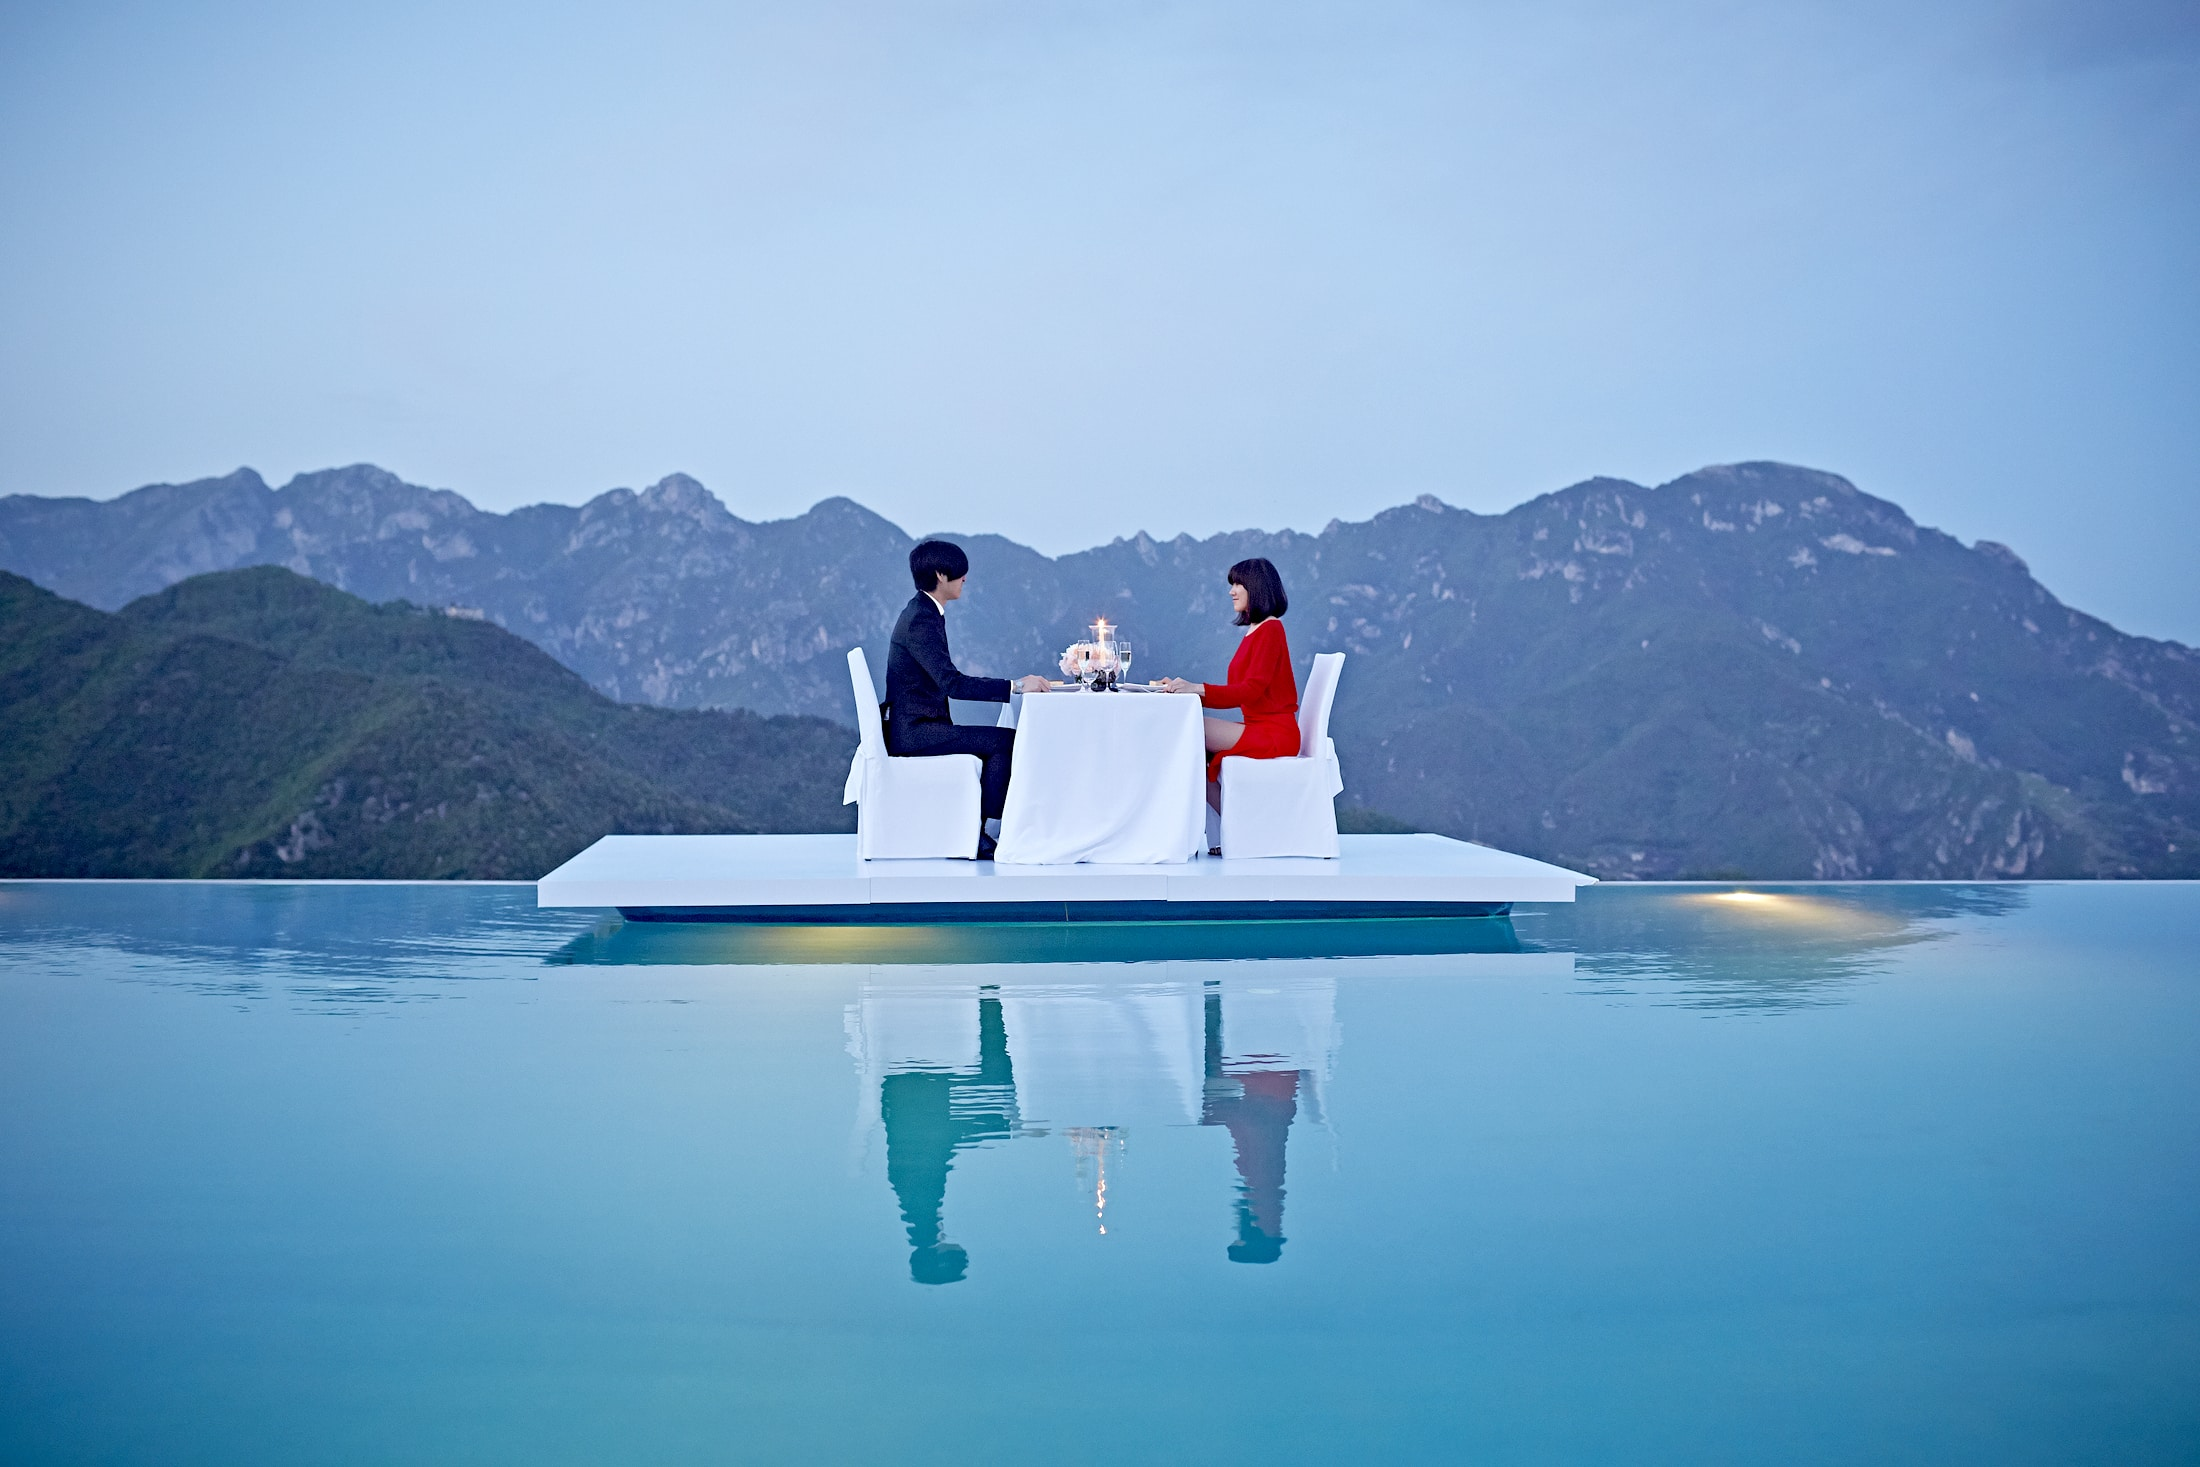 Floating Romantic Dinner @ Belmond Hotel Caruso